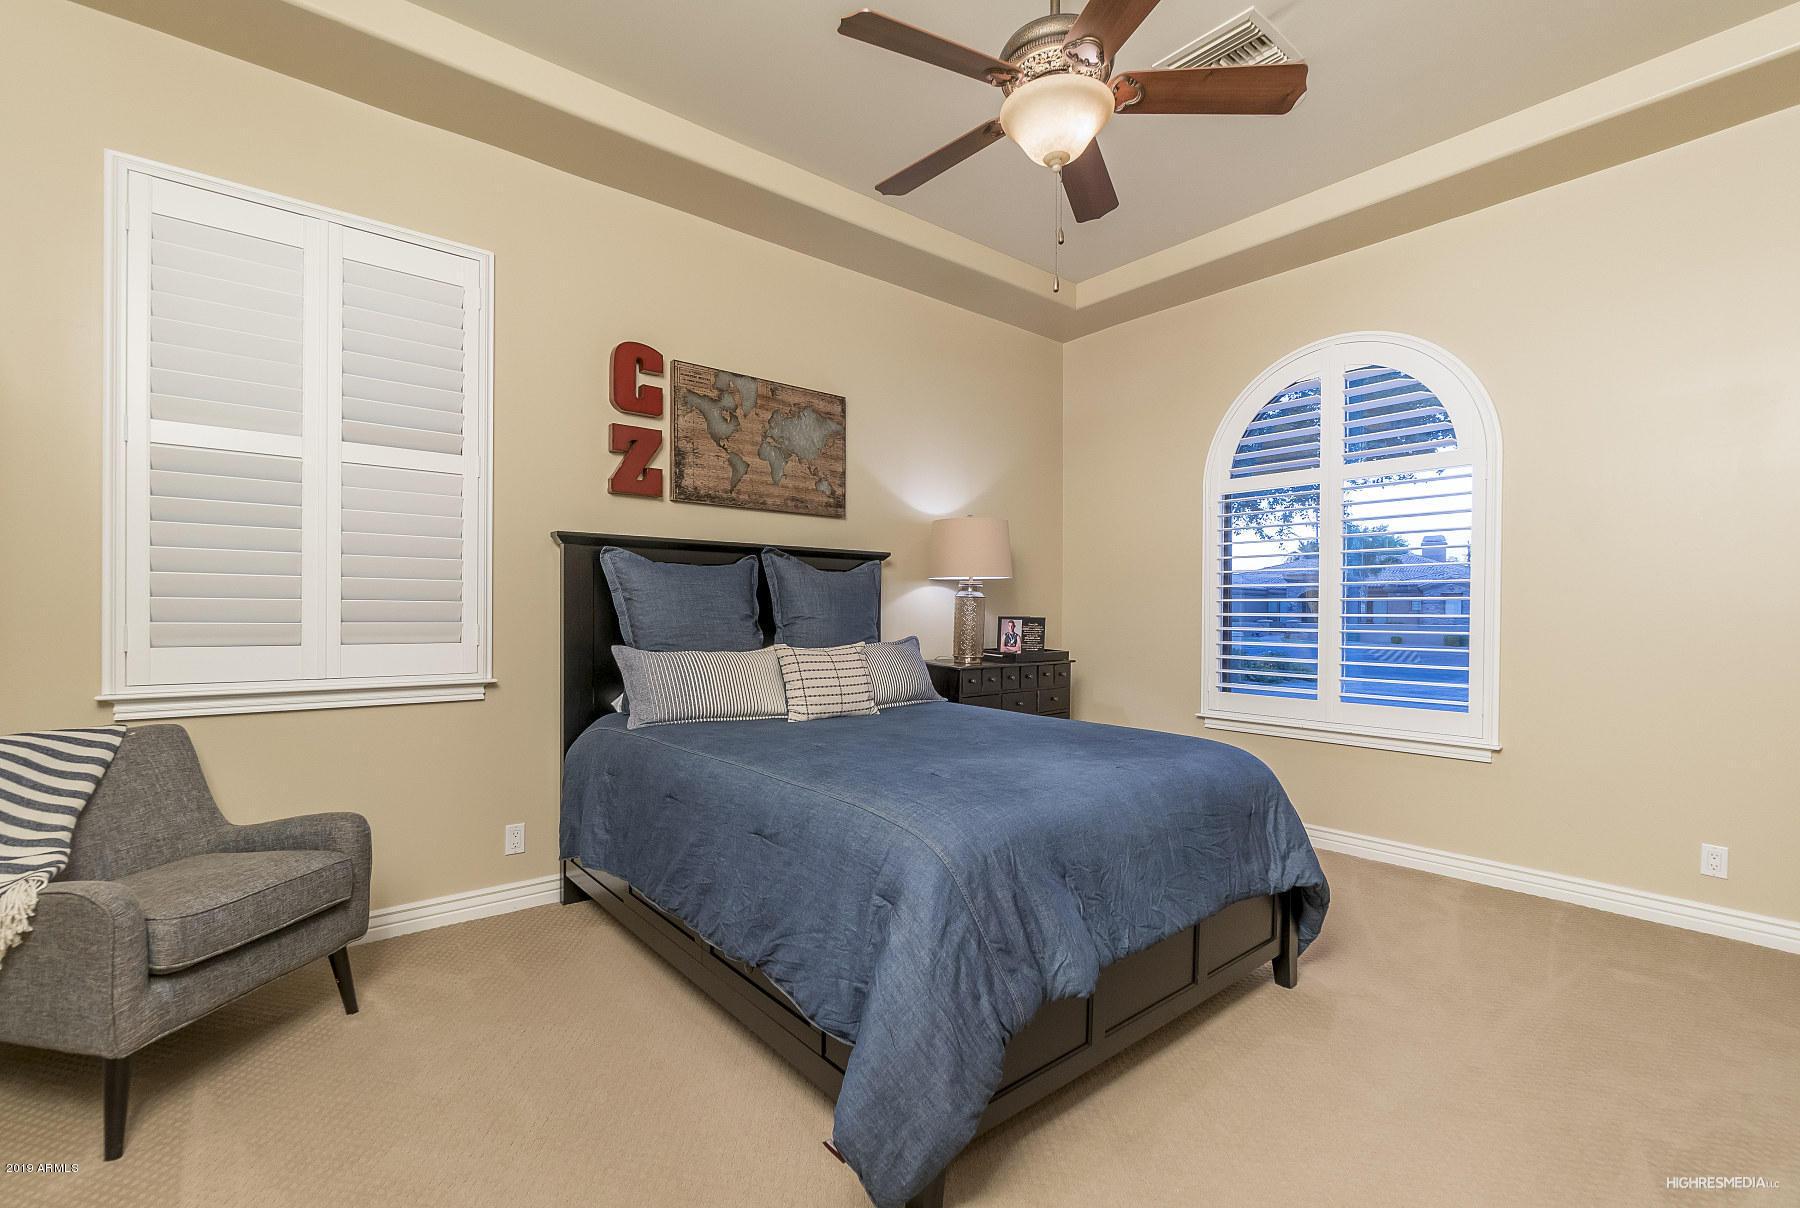 MLS 5946425 2027 E TEAKWOOD Place, Chandler, AZ 85249 4 Bedrooms